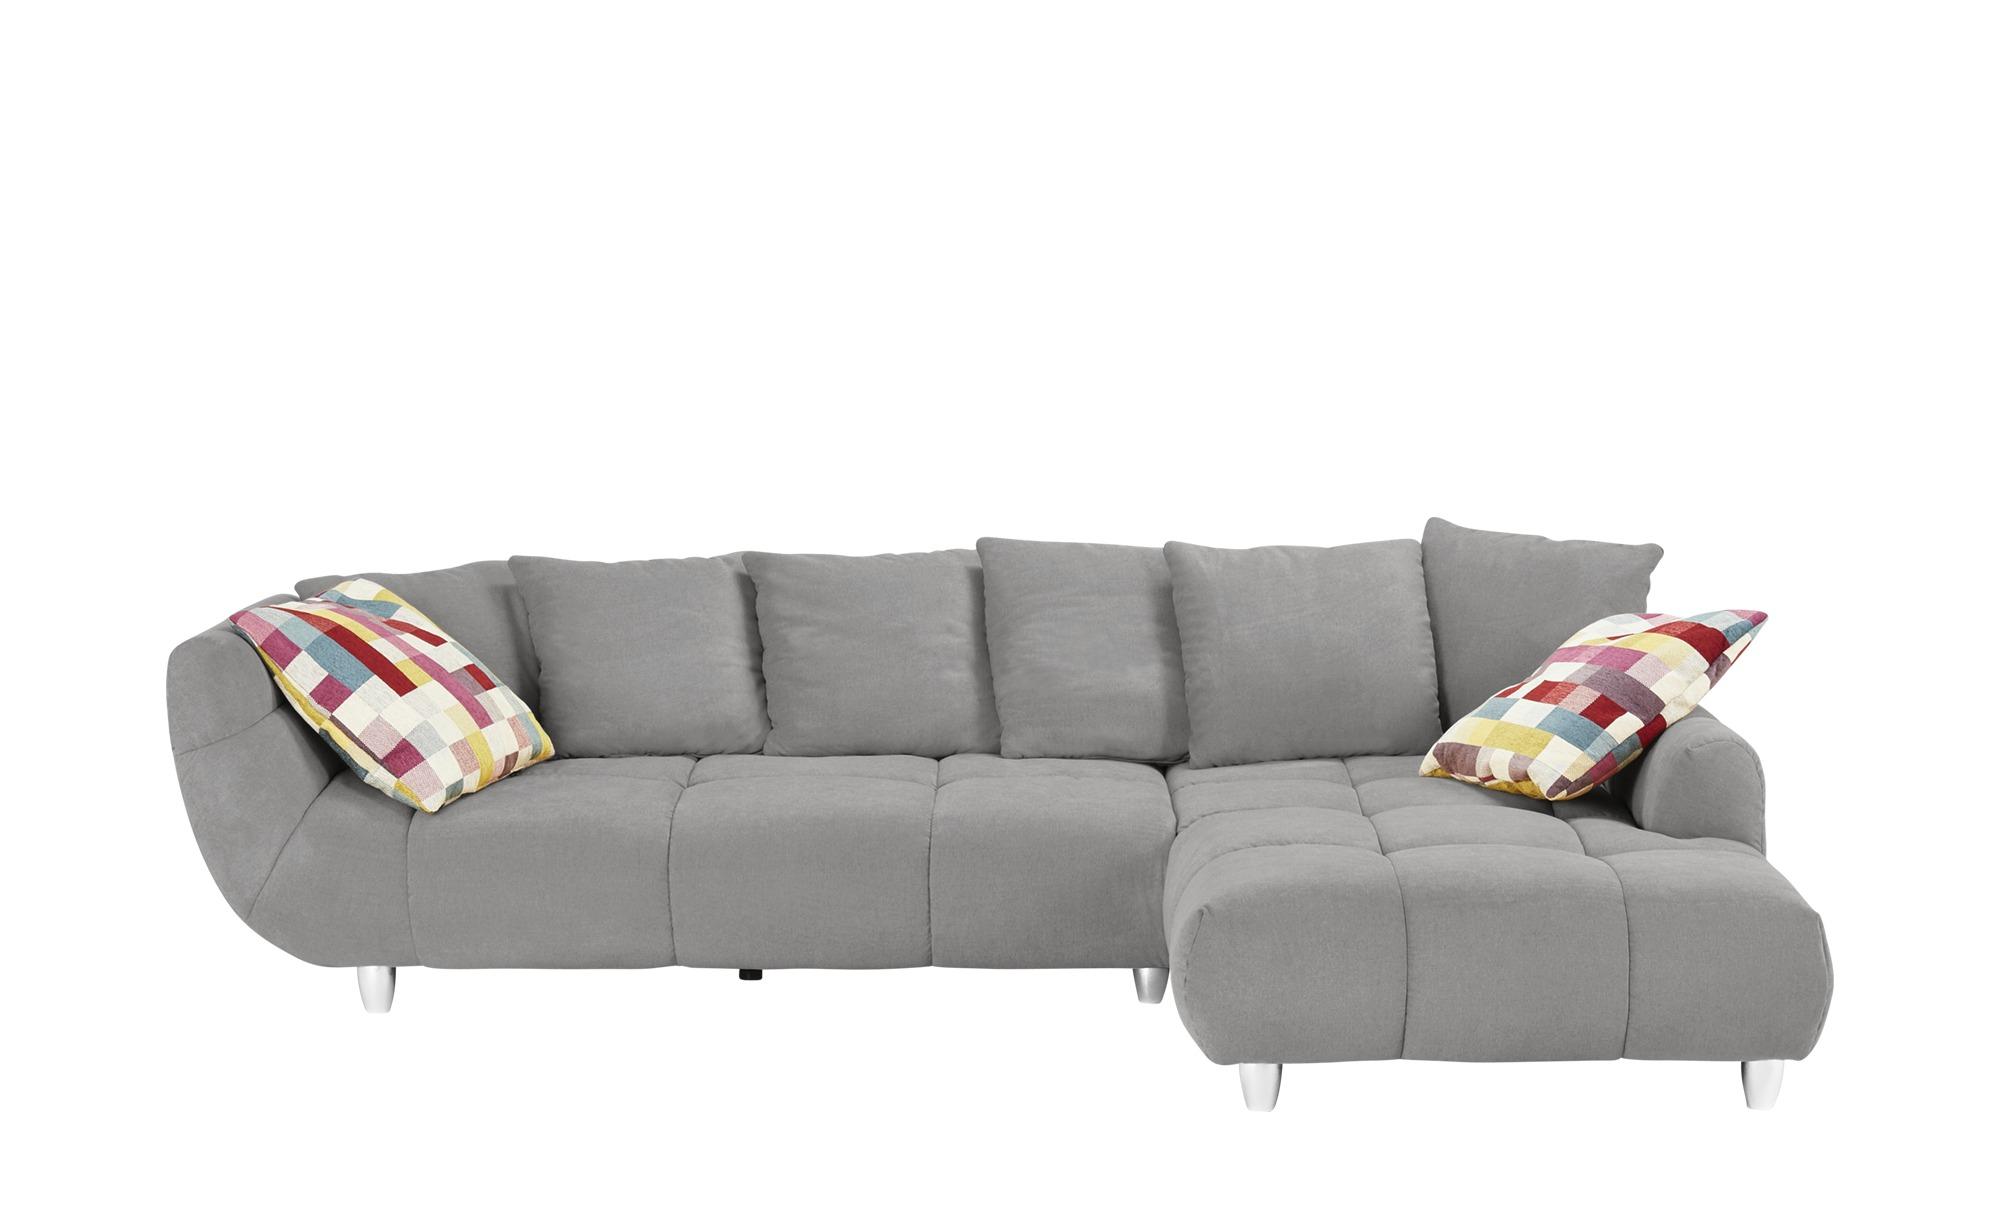 Ecksofa imke breite h he 90 cm grau online kaufen bei woonio for Ecksofa breite 200 cm